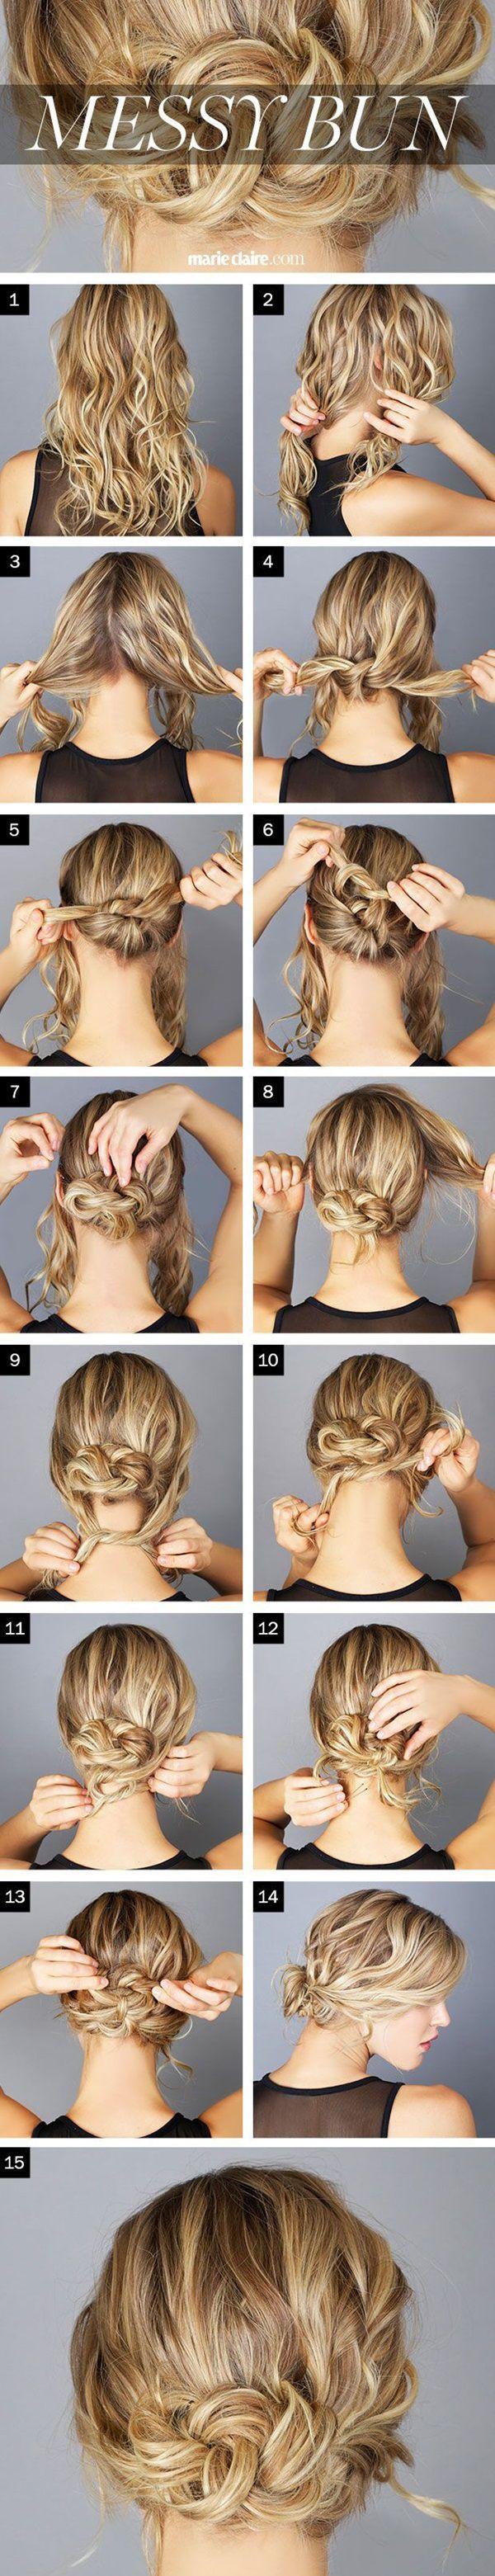 easy sexy beautiful bun hairstyles tutorials how to make messy bun